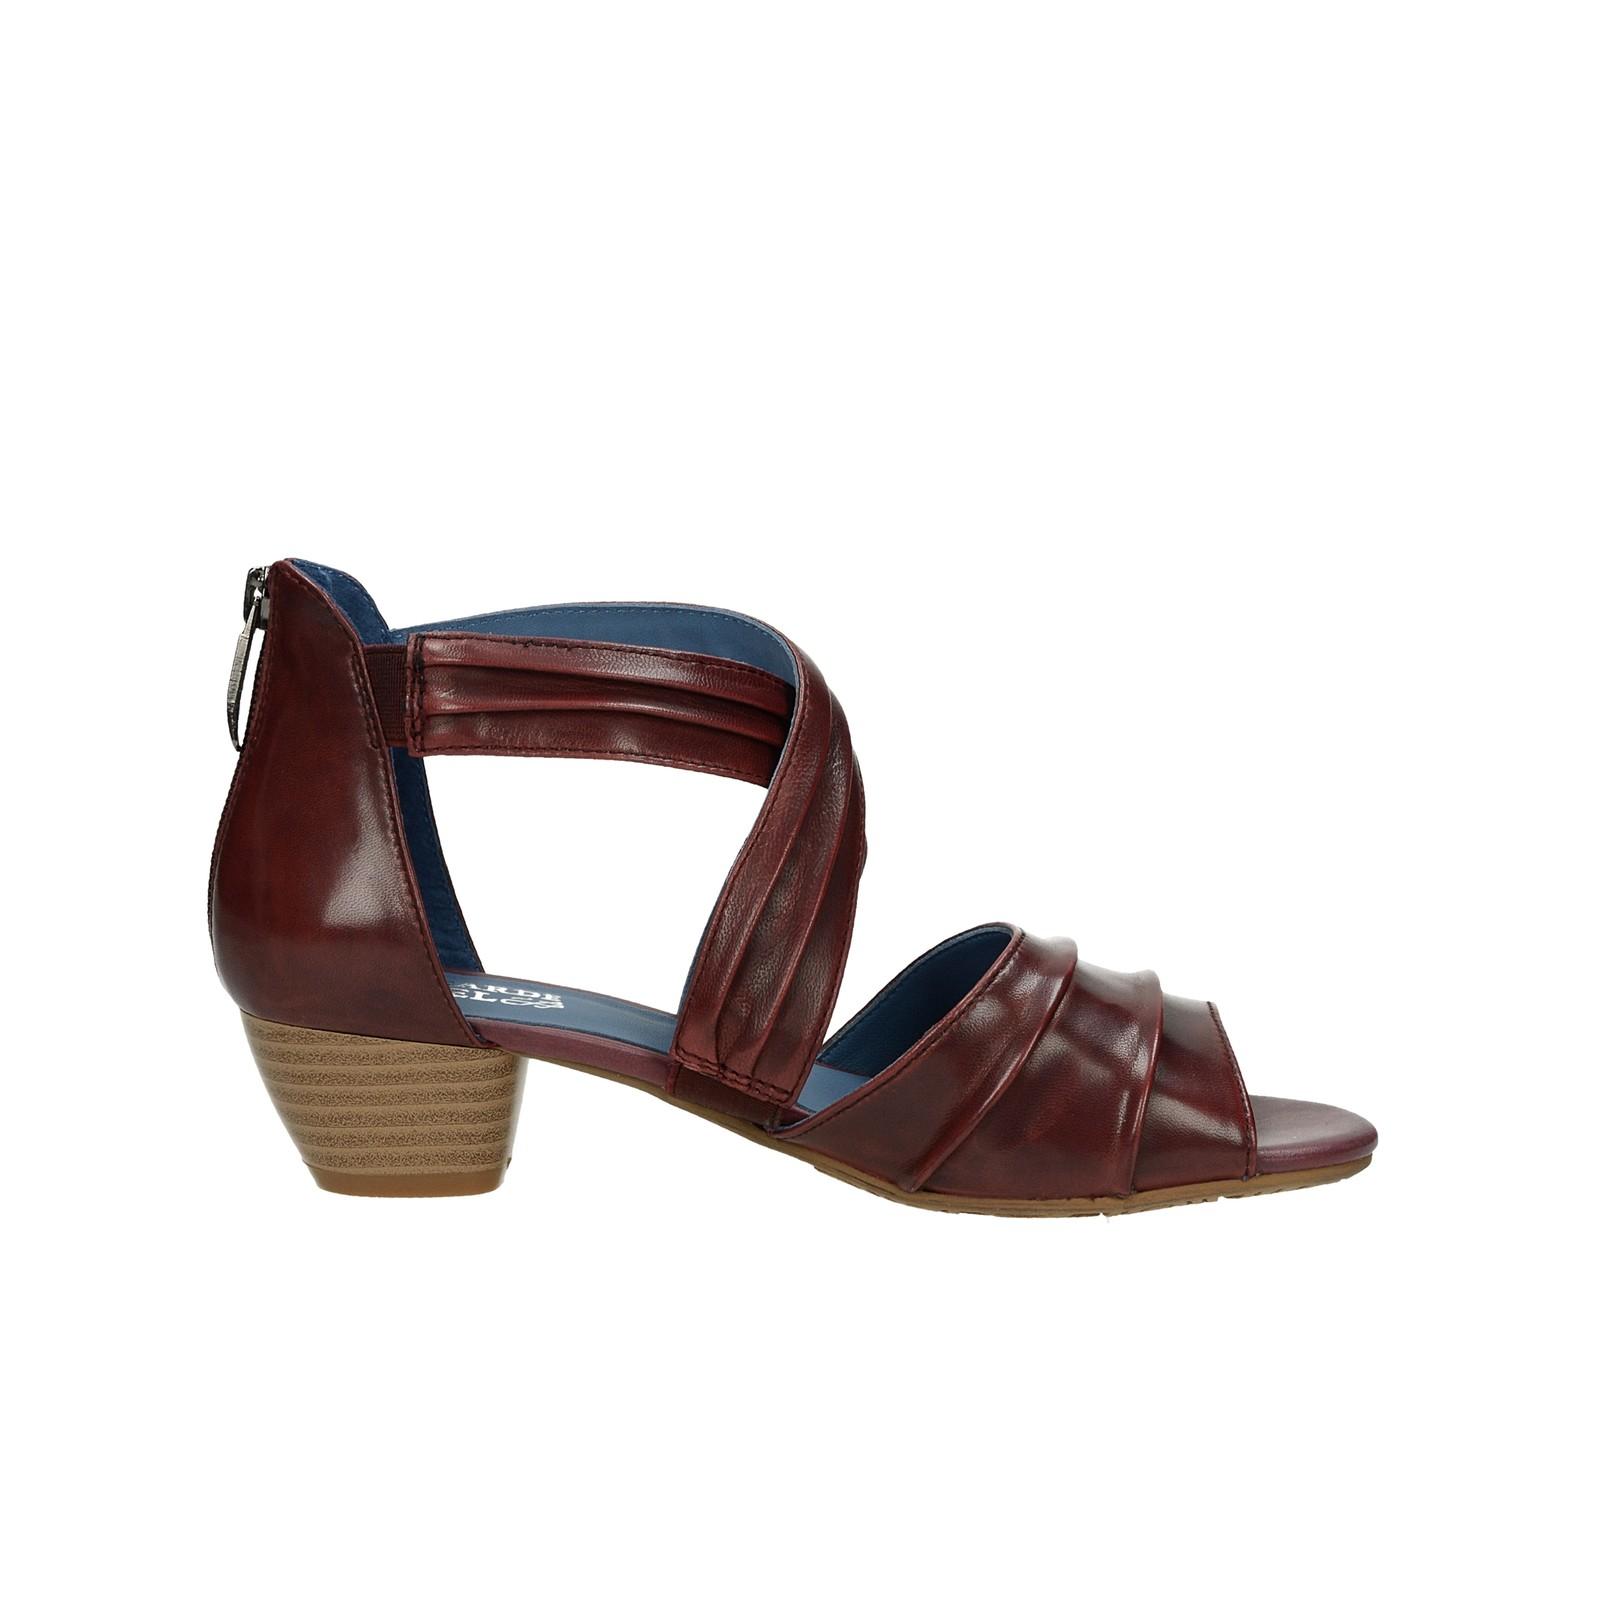 Regarde le ciel dámské kožené sandály - bordó